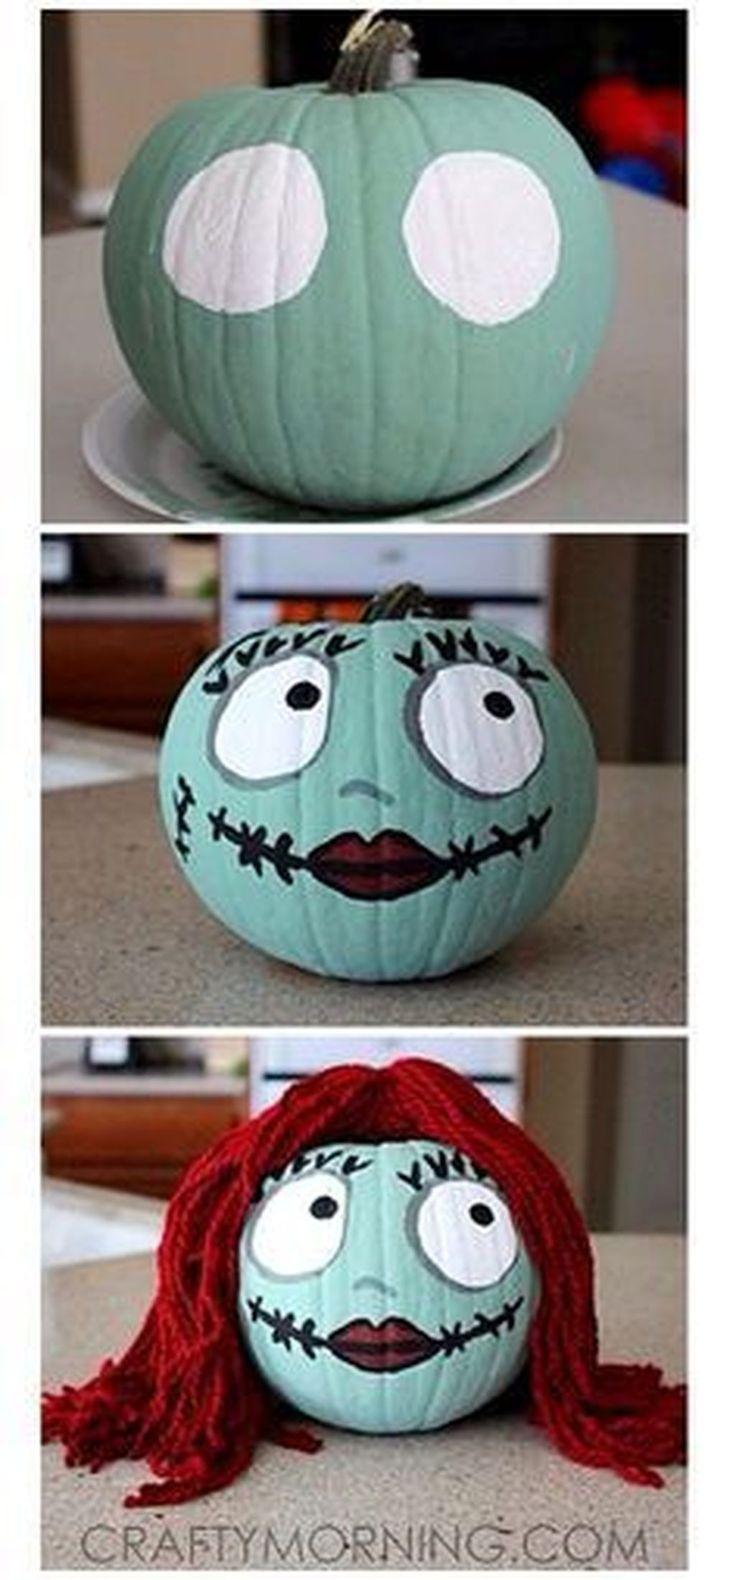 awesome 43 Creepy but Cute Disney Themed Halloween Decoration Ideas  https://decoralink.com/2017/10/13/43-creepy-cute-disney-themed-halloween-decoration-ideas/